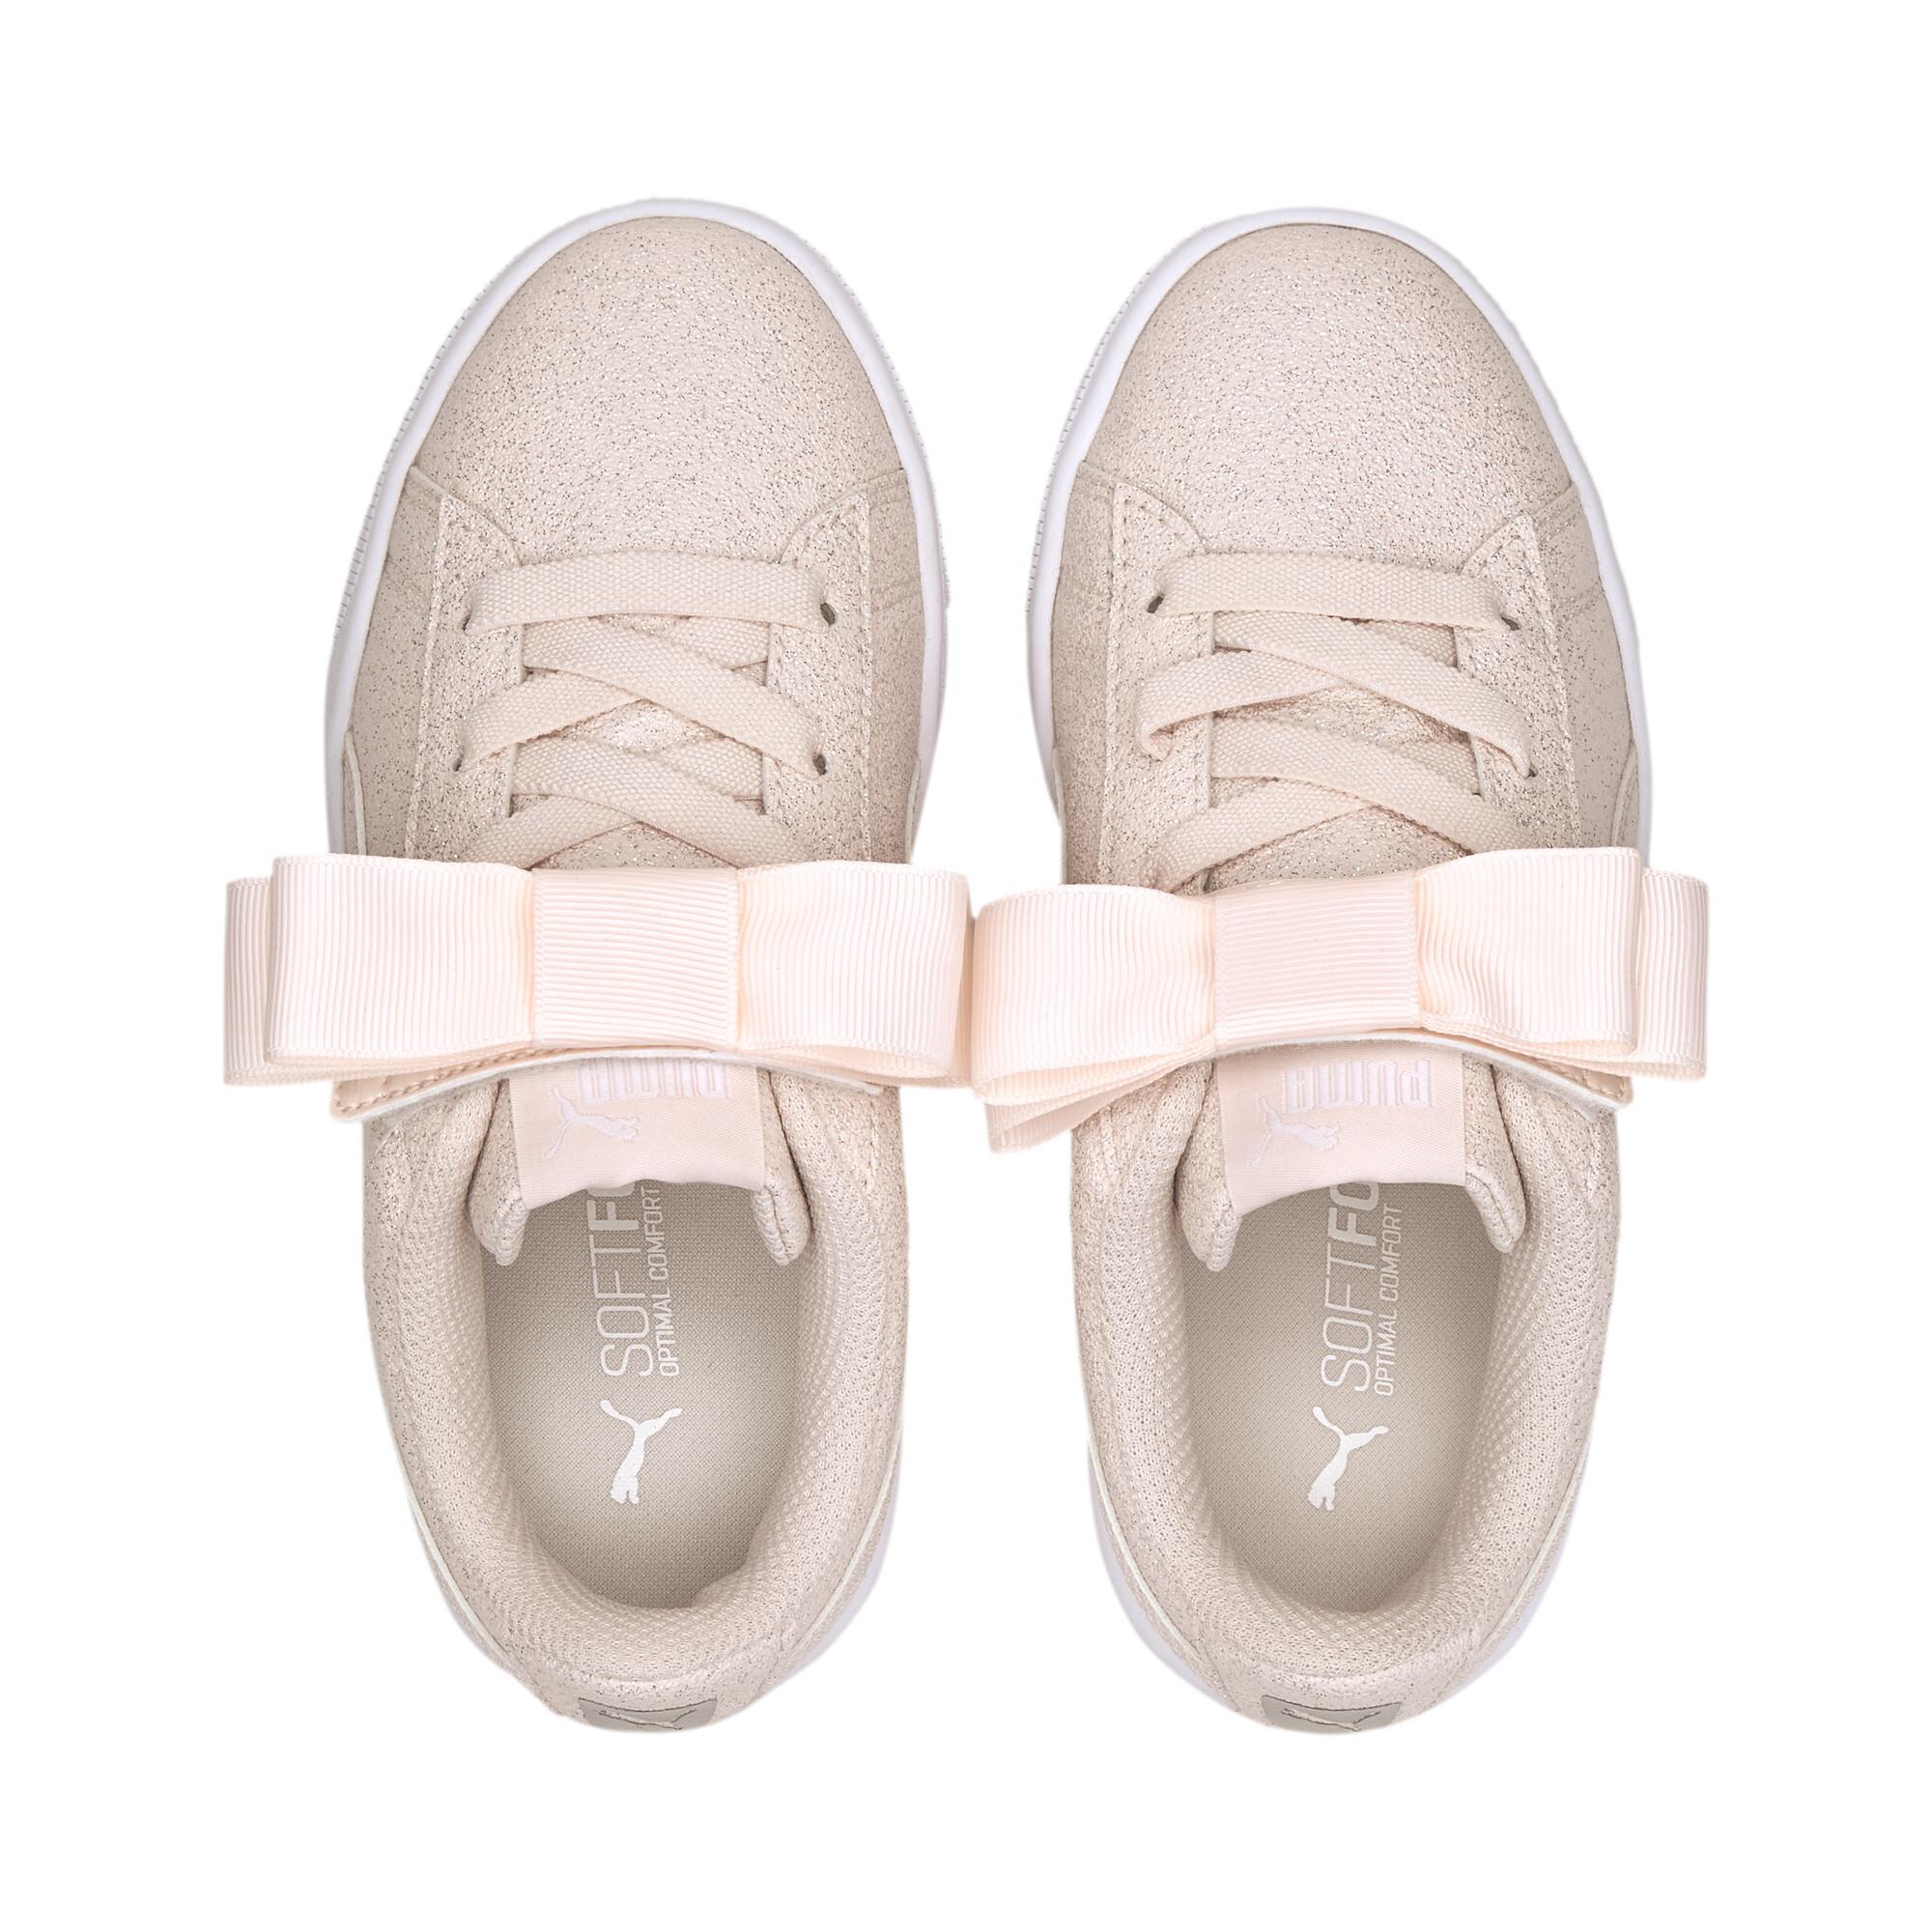 PUMA-Vikky-v2-Ribbon-Glitz-Little-Kids-039-Shoes-Girls-Shoe-Kids thumbnail 7